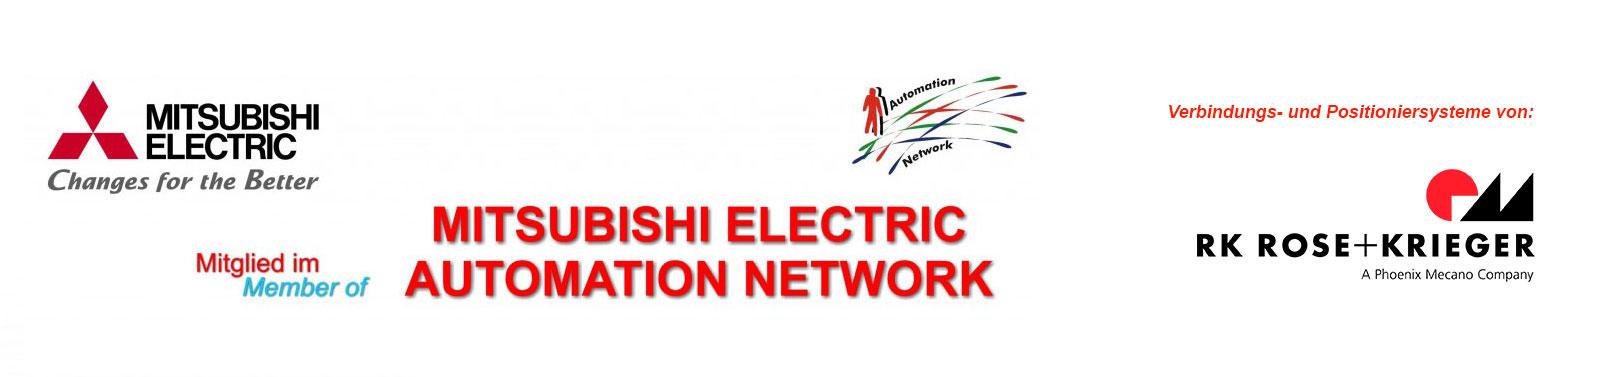 Technology partners RK-AHT